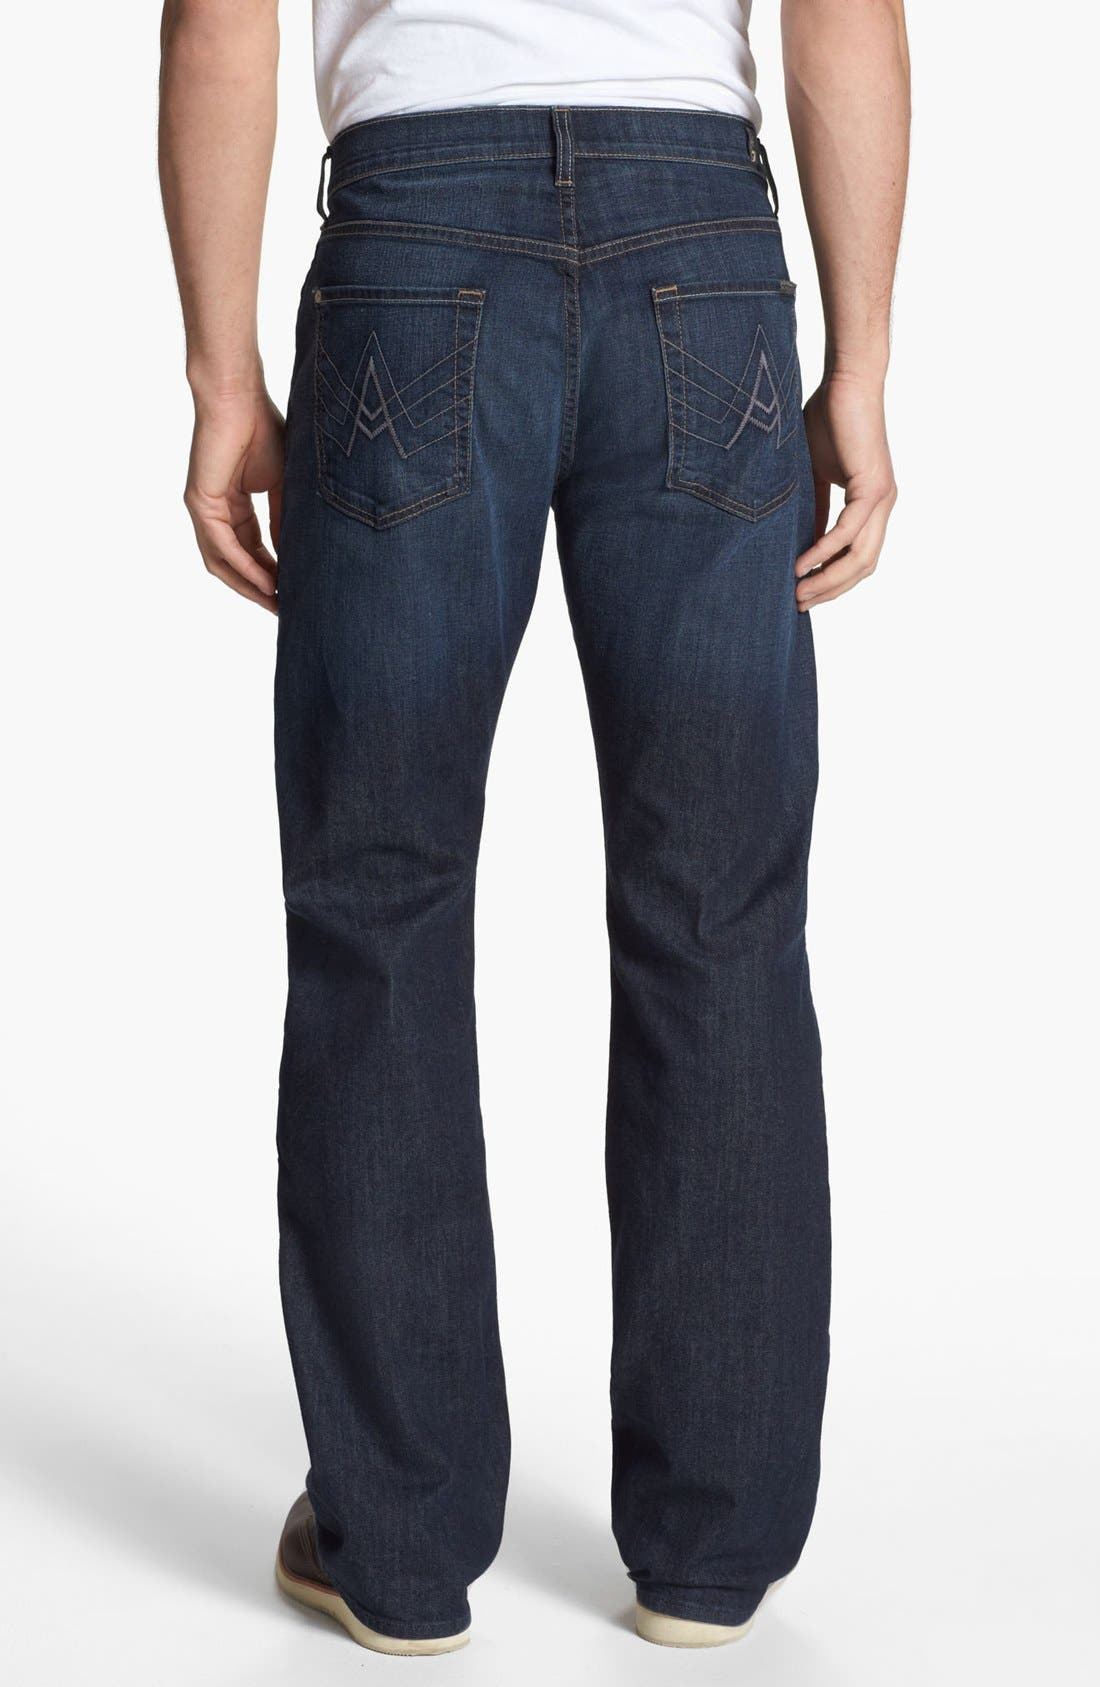 Main Image - 7 For All Mankind® 'Brett' Bootcut Jeans (Worn Hawthorne)